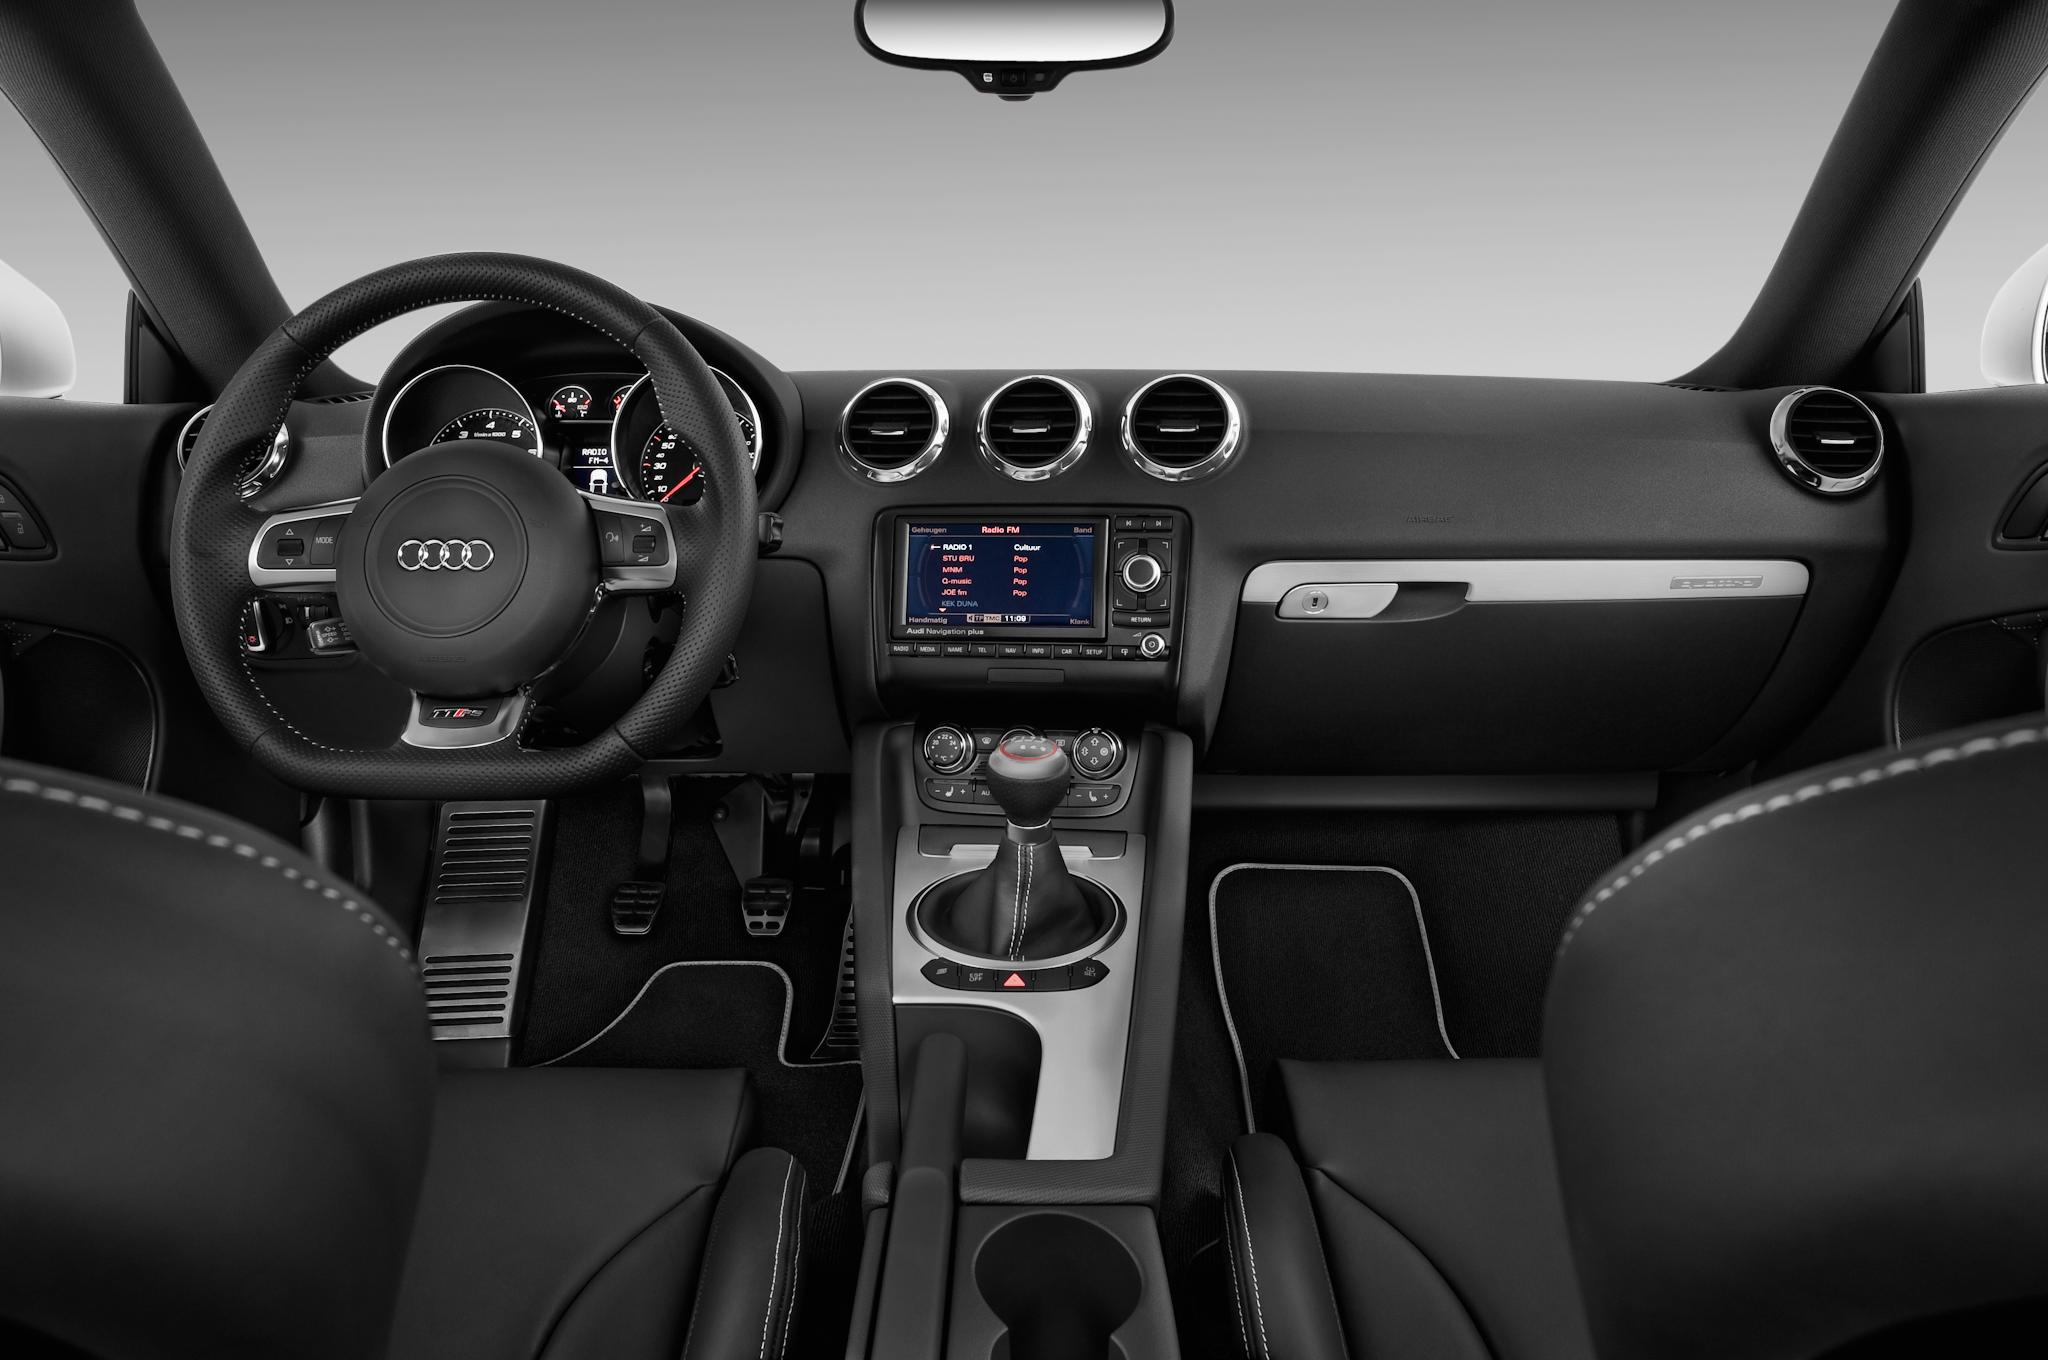 next gen audi tt rs spied winter testing with manual transmission rh automobilemag com 2005 Audi TT 2003 Audi TT